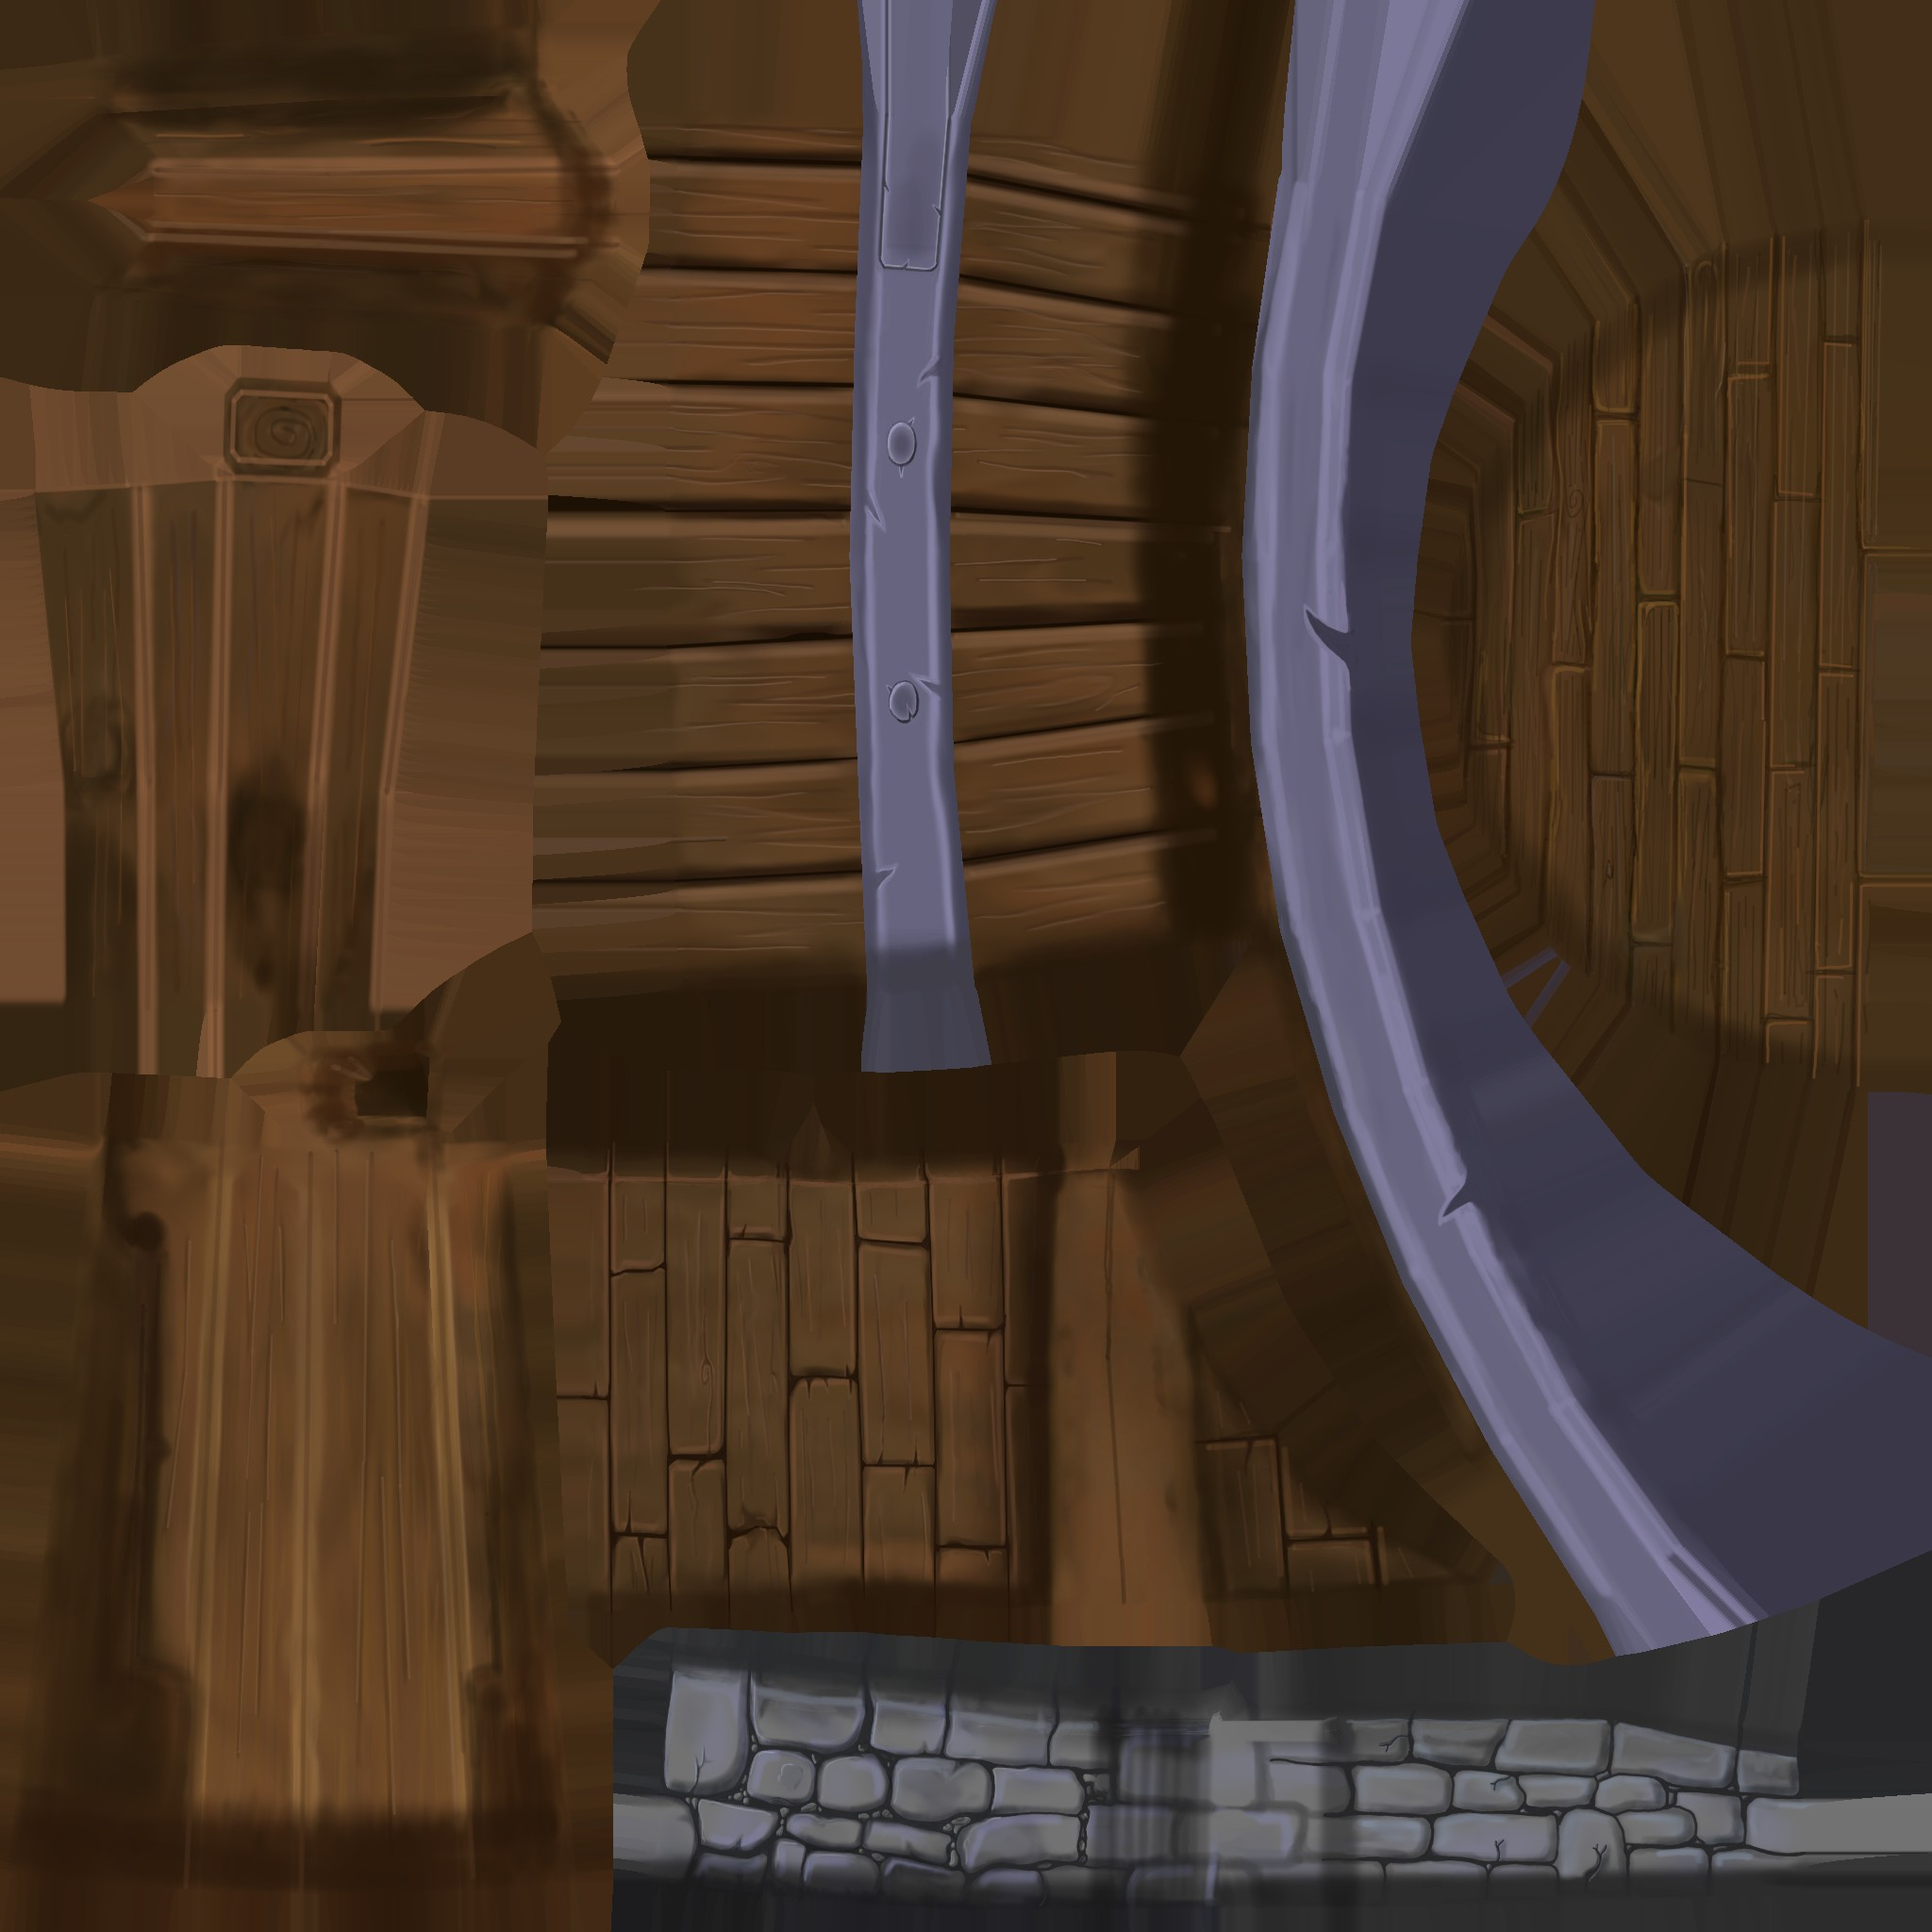 Tavern_Setup_Building_Diffuse.jpg